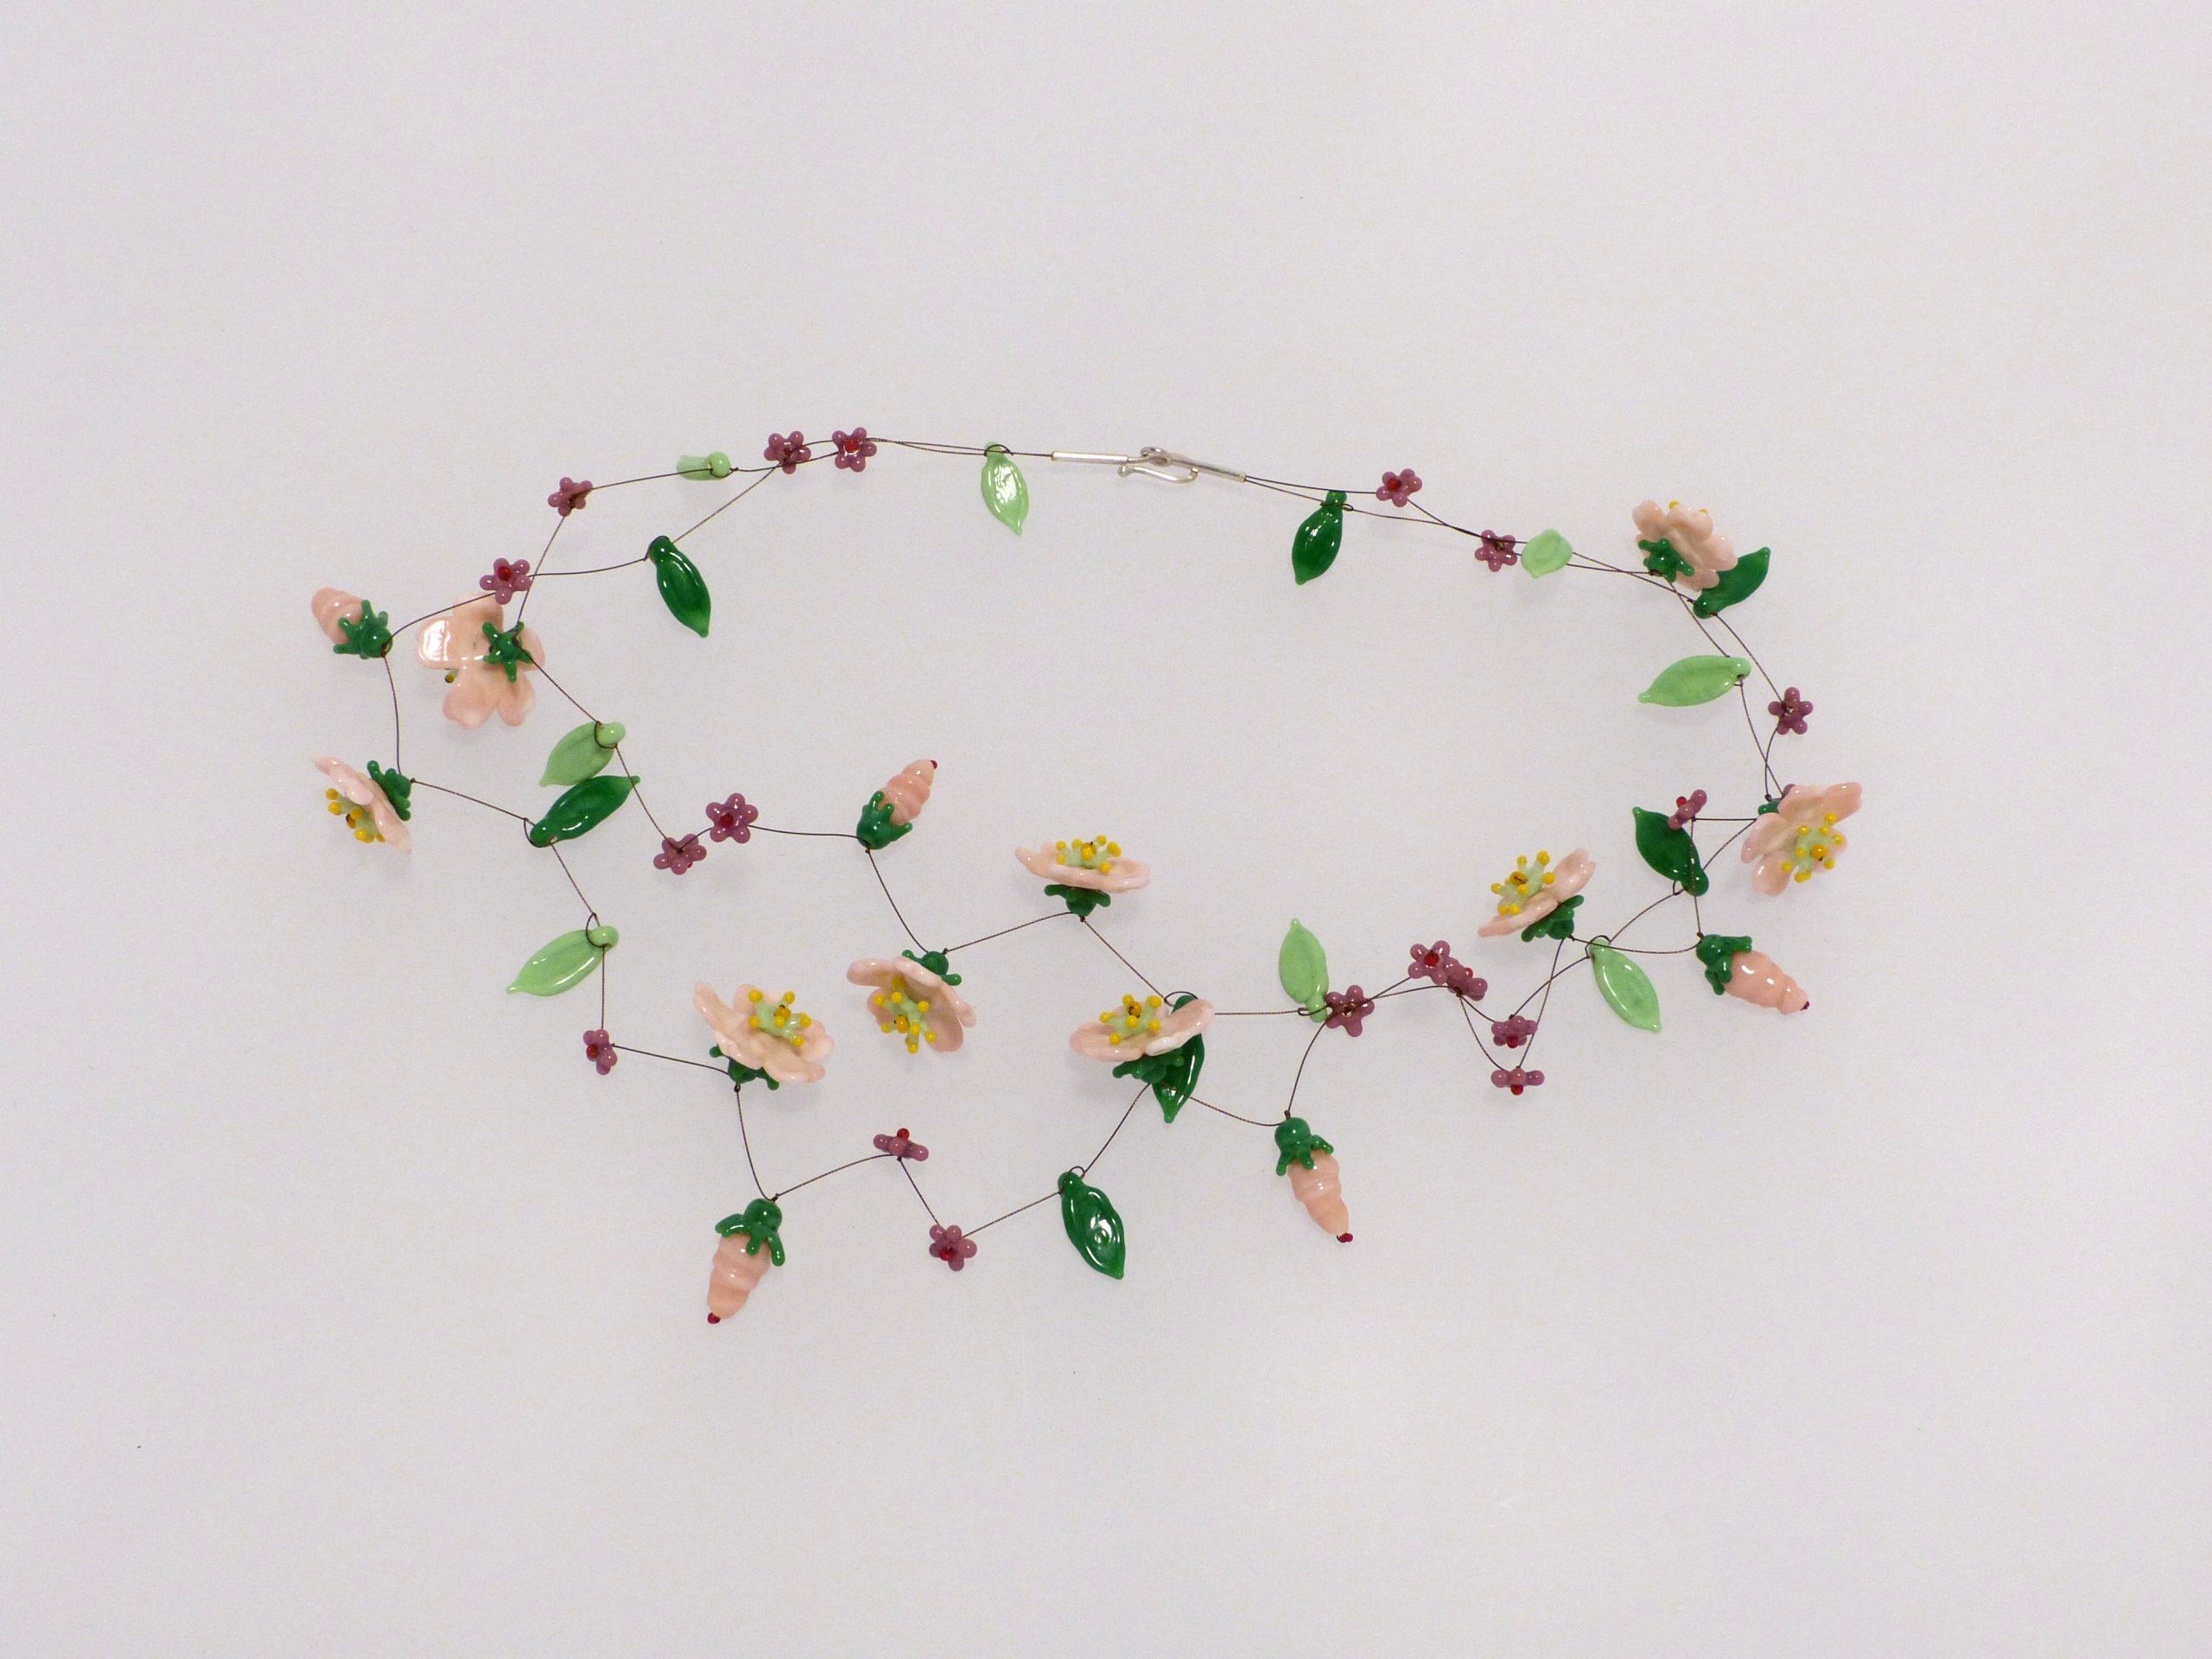 rosa Blüten | 2 Str. Glas Stahlseil, Silber | 130982-19